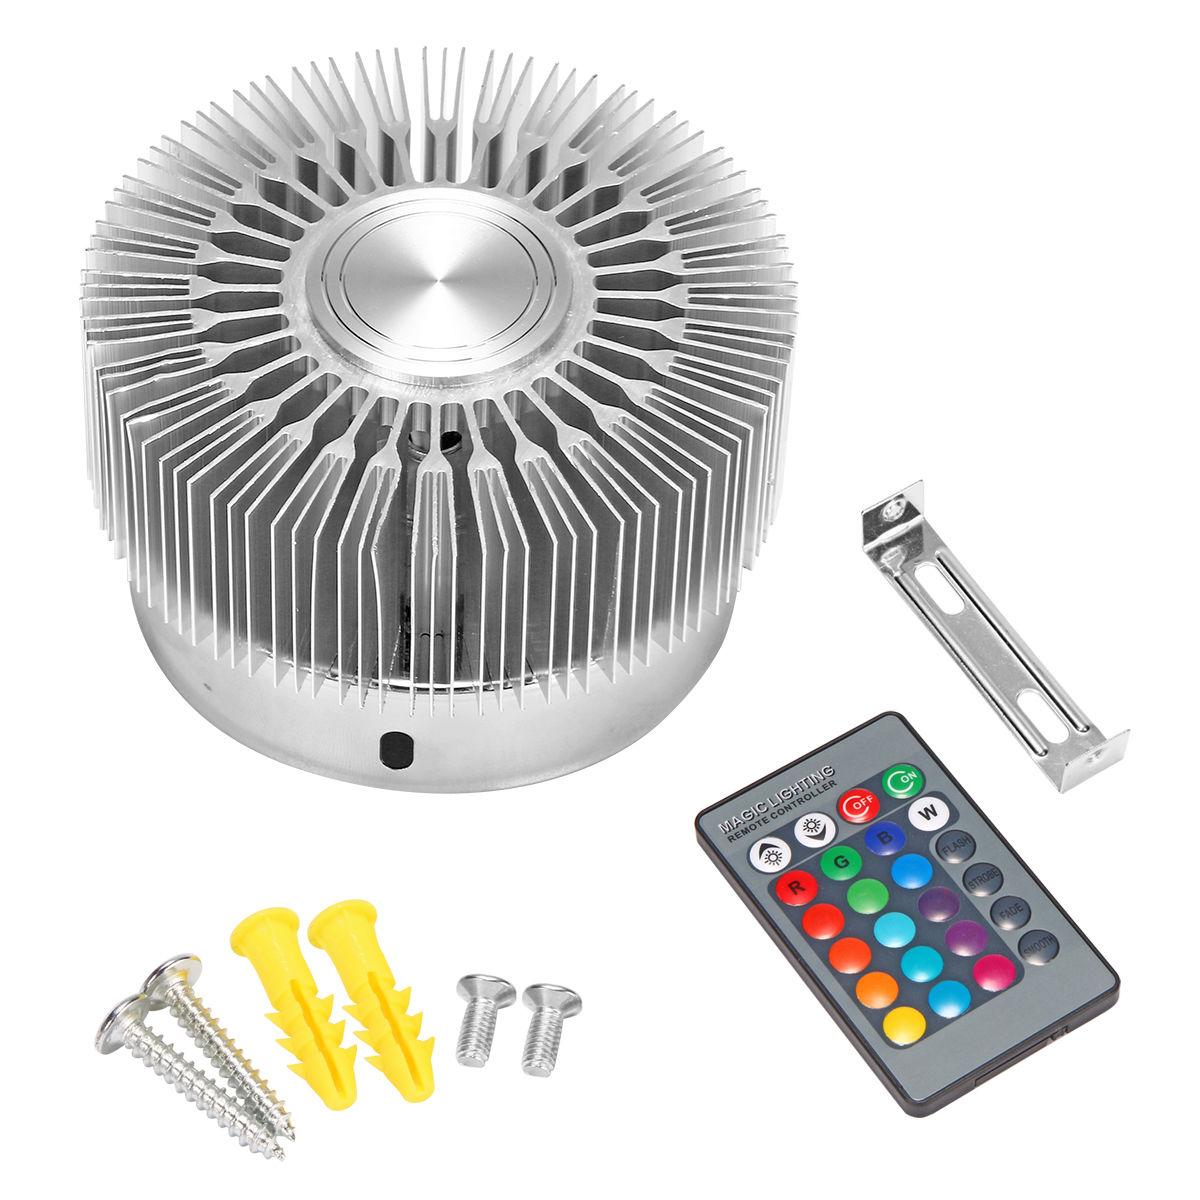 Led Home Lighting Fixtures: 3W High Power LED Wall Light Sconce RGB Lighting Home